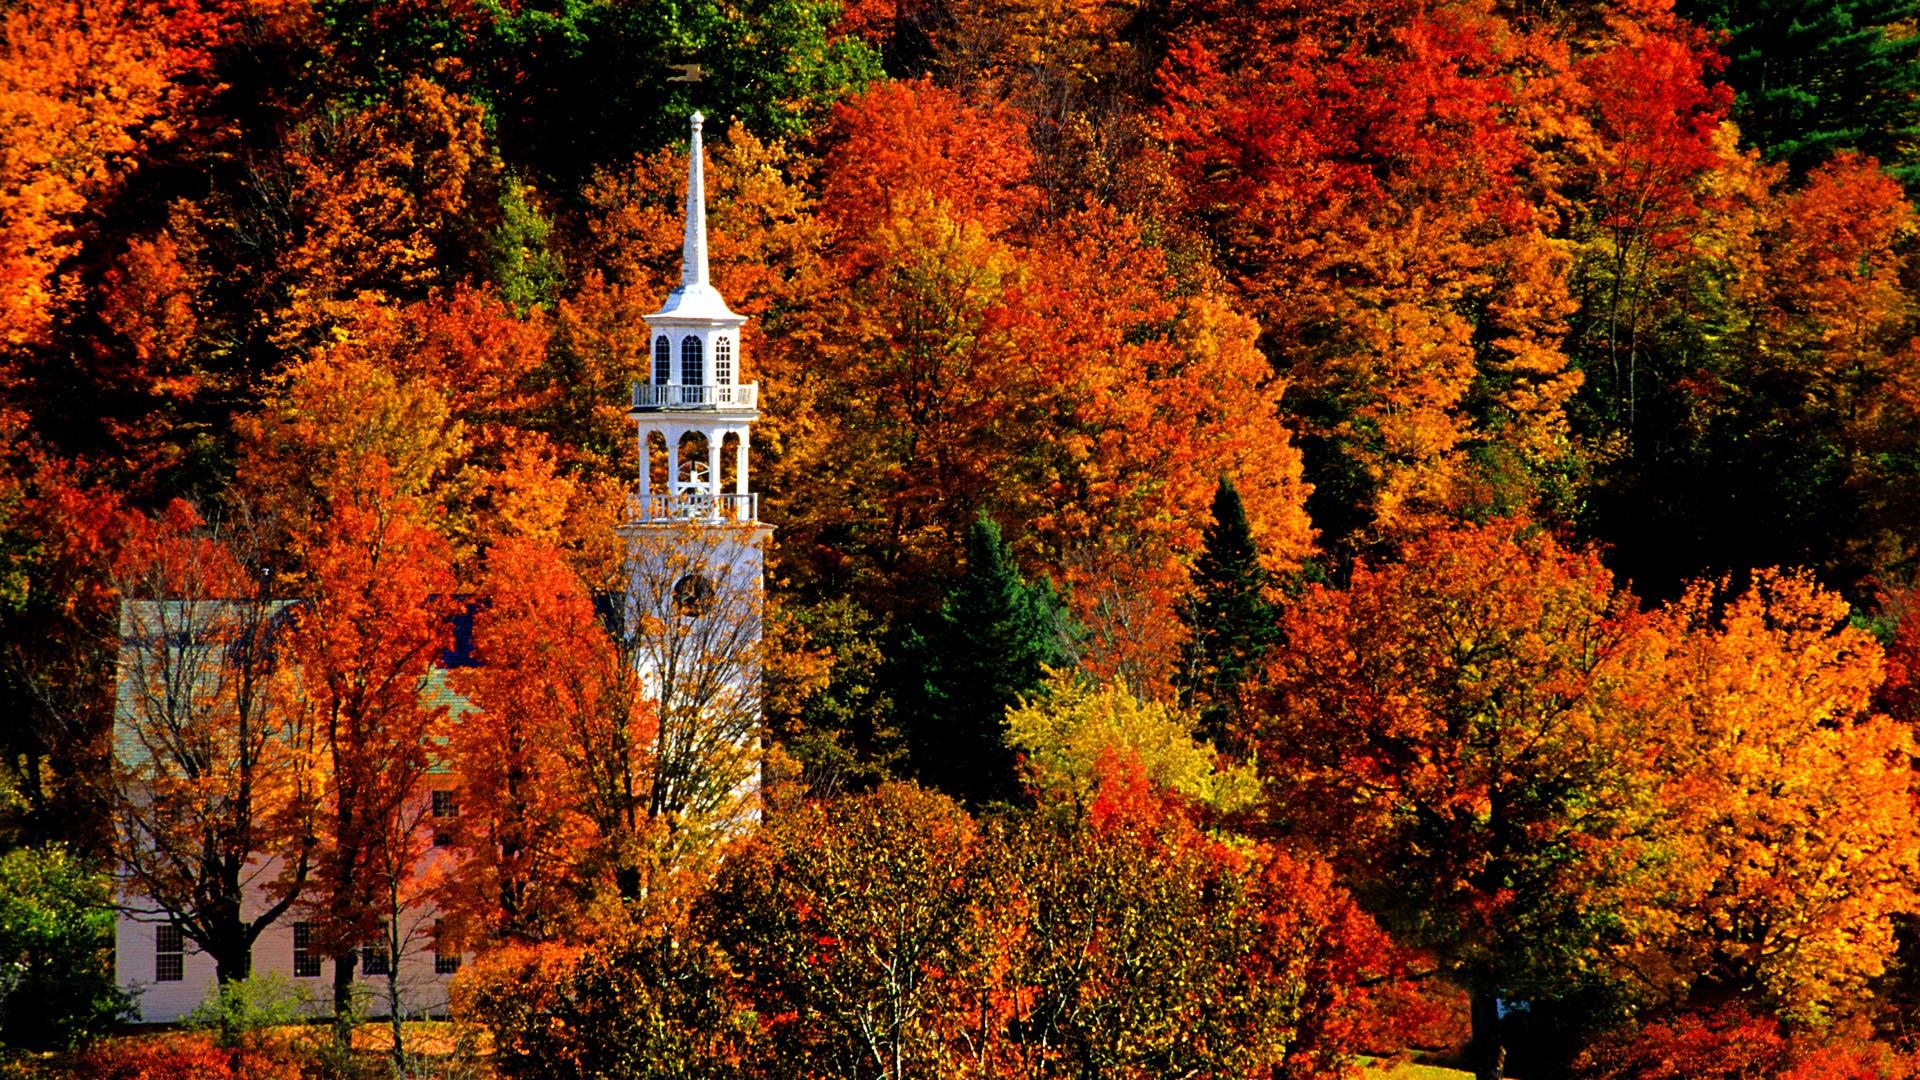 Church in Peak Fall Color, Strafford - 1920x1080 - Full HD Wallpaper